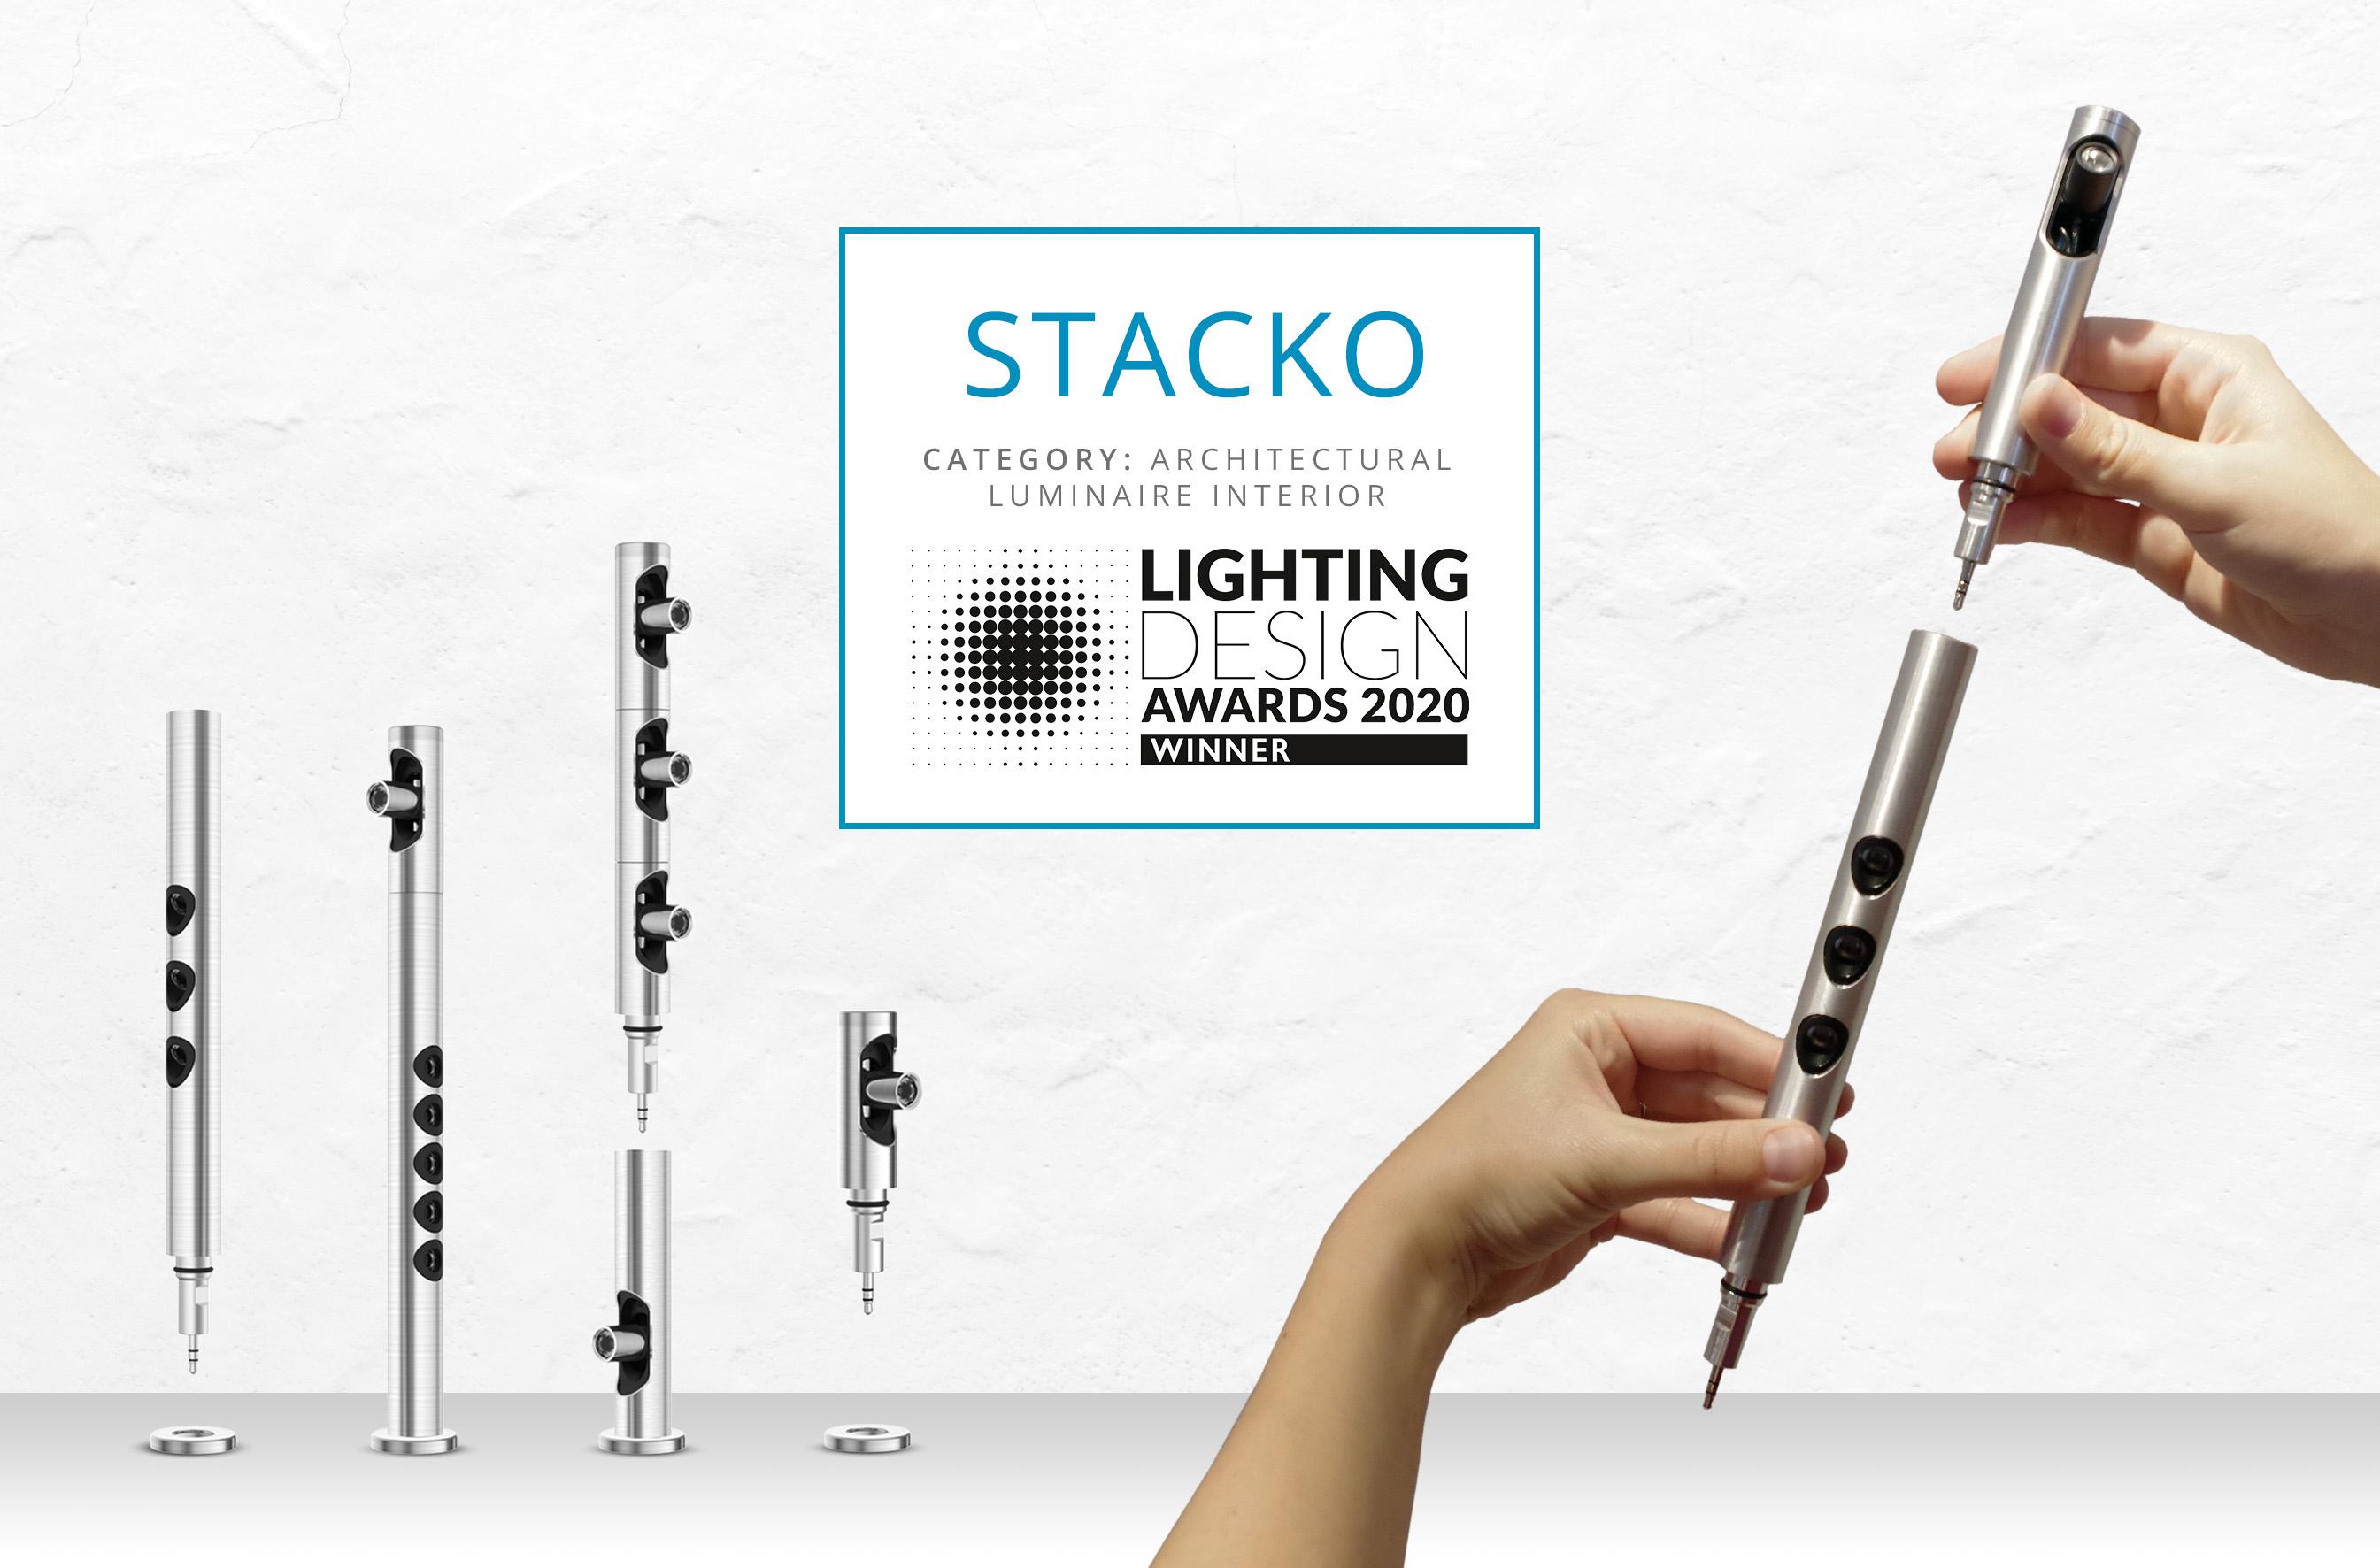 Stacko wins a Lighting Design Award!